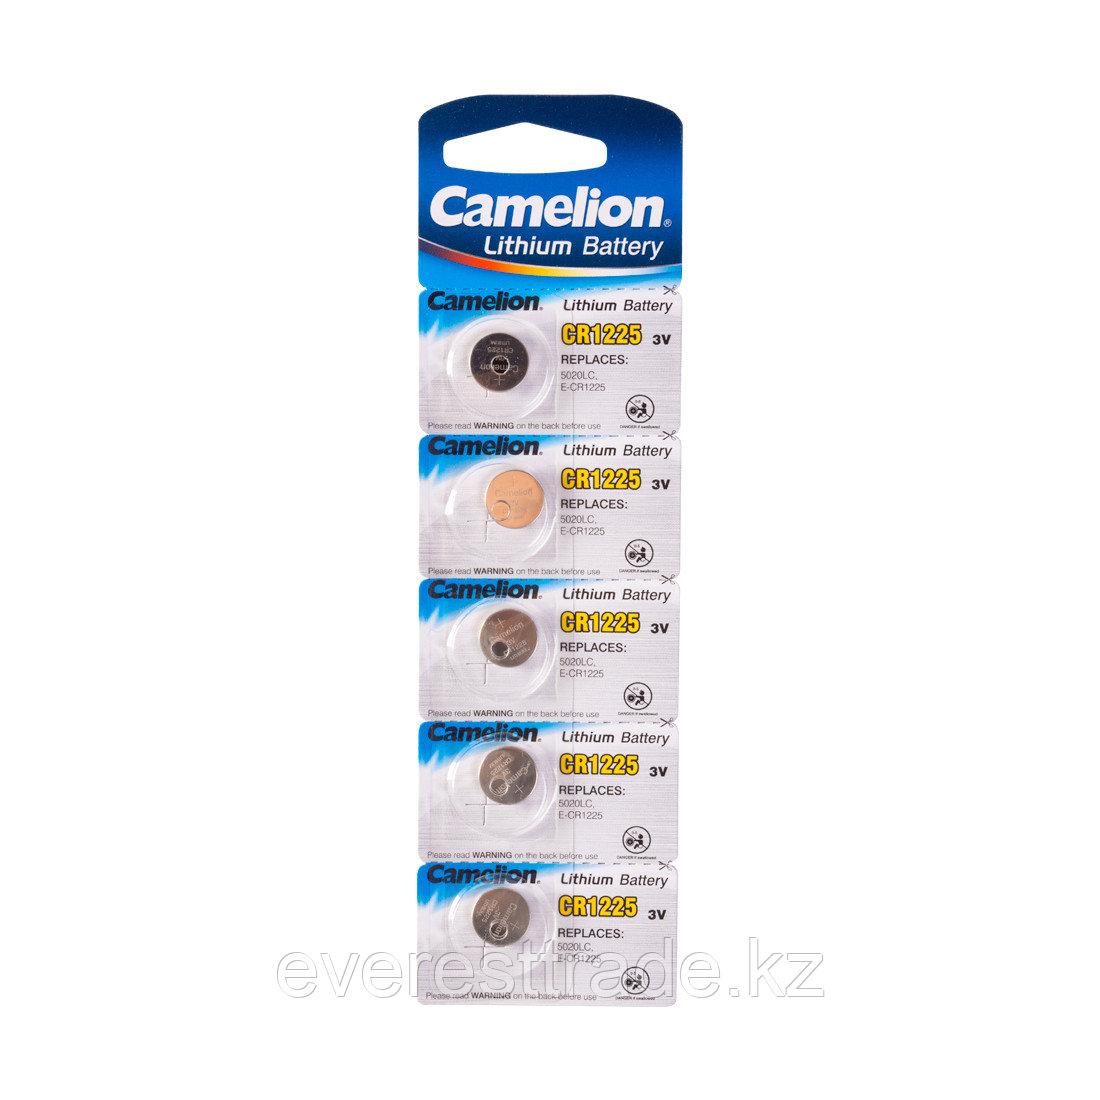 Camelion Батарейка, CAMELION, CR1225-BP5 Lithium Battery, CR1225 3V, 220 mAh, 5 шт. в блистере